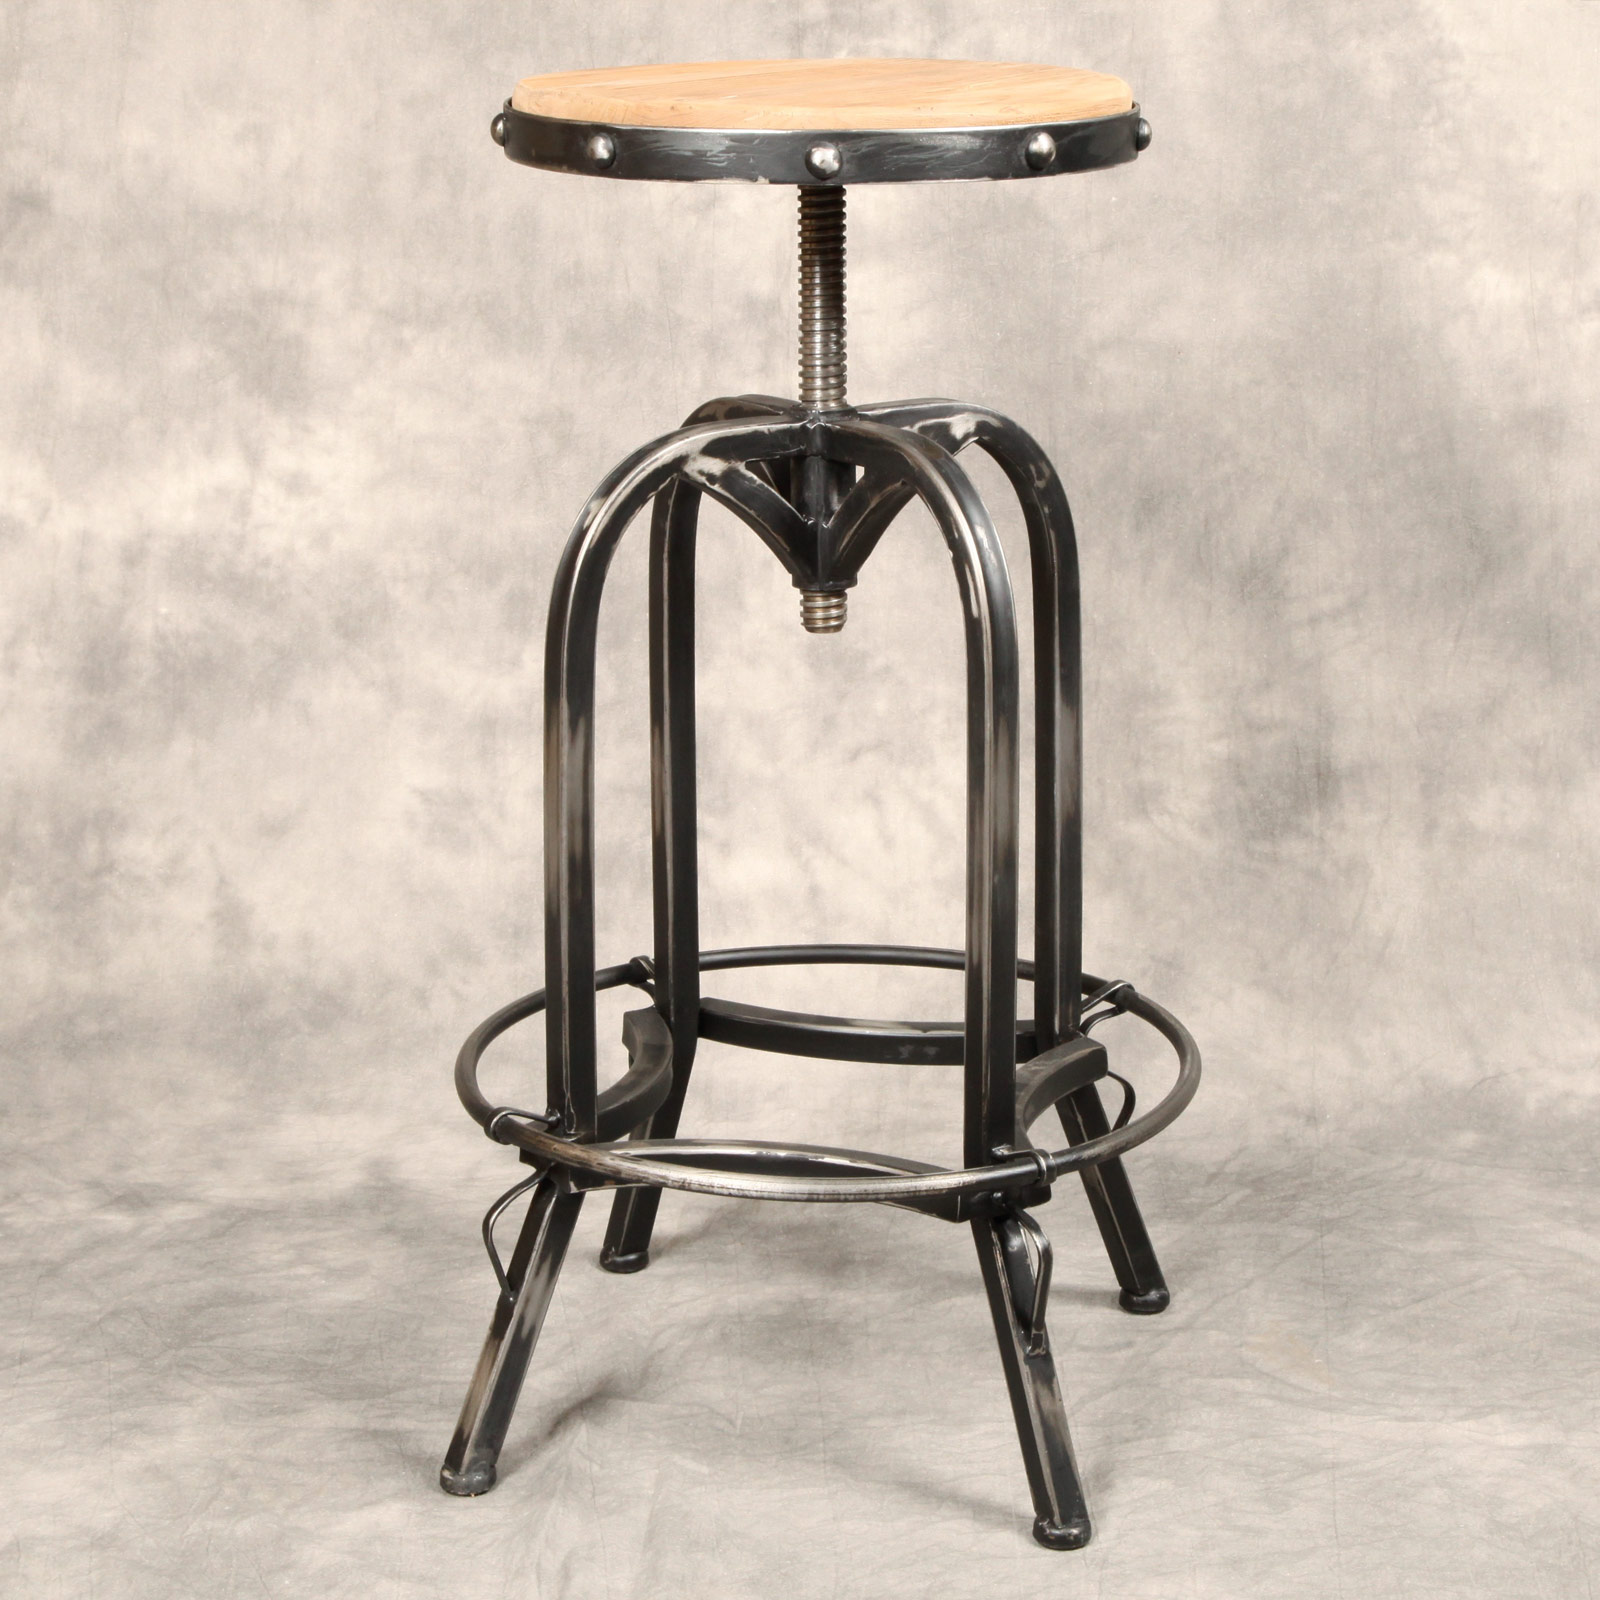 Industrial Antique Iron Bar Stool Reclaimed Wood Seat eBay : pv nhdt nobs1frnt from www.ebay.com size 1600 x 1600 jpeg 354kB